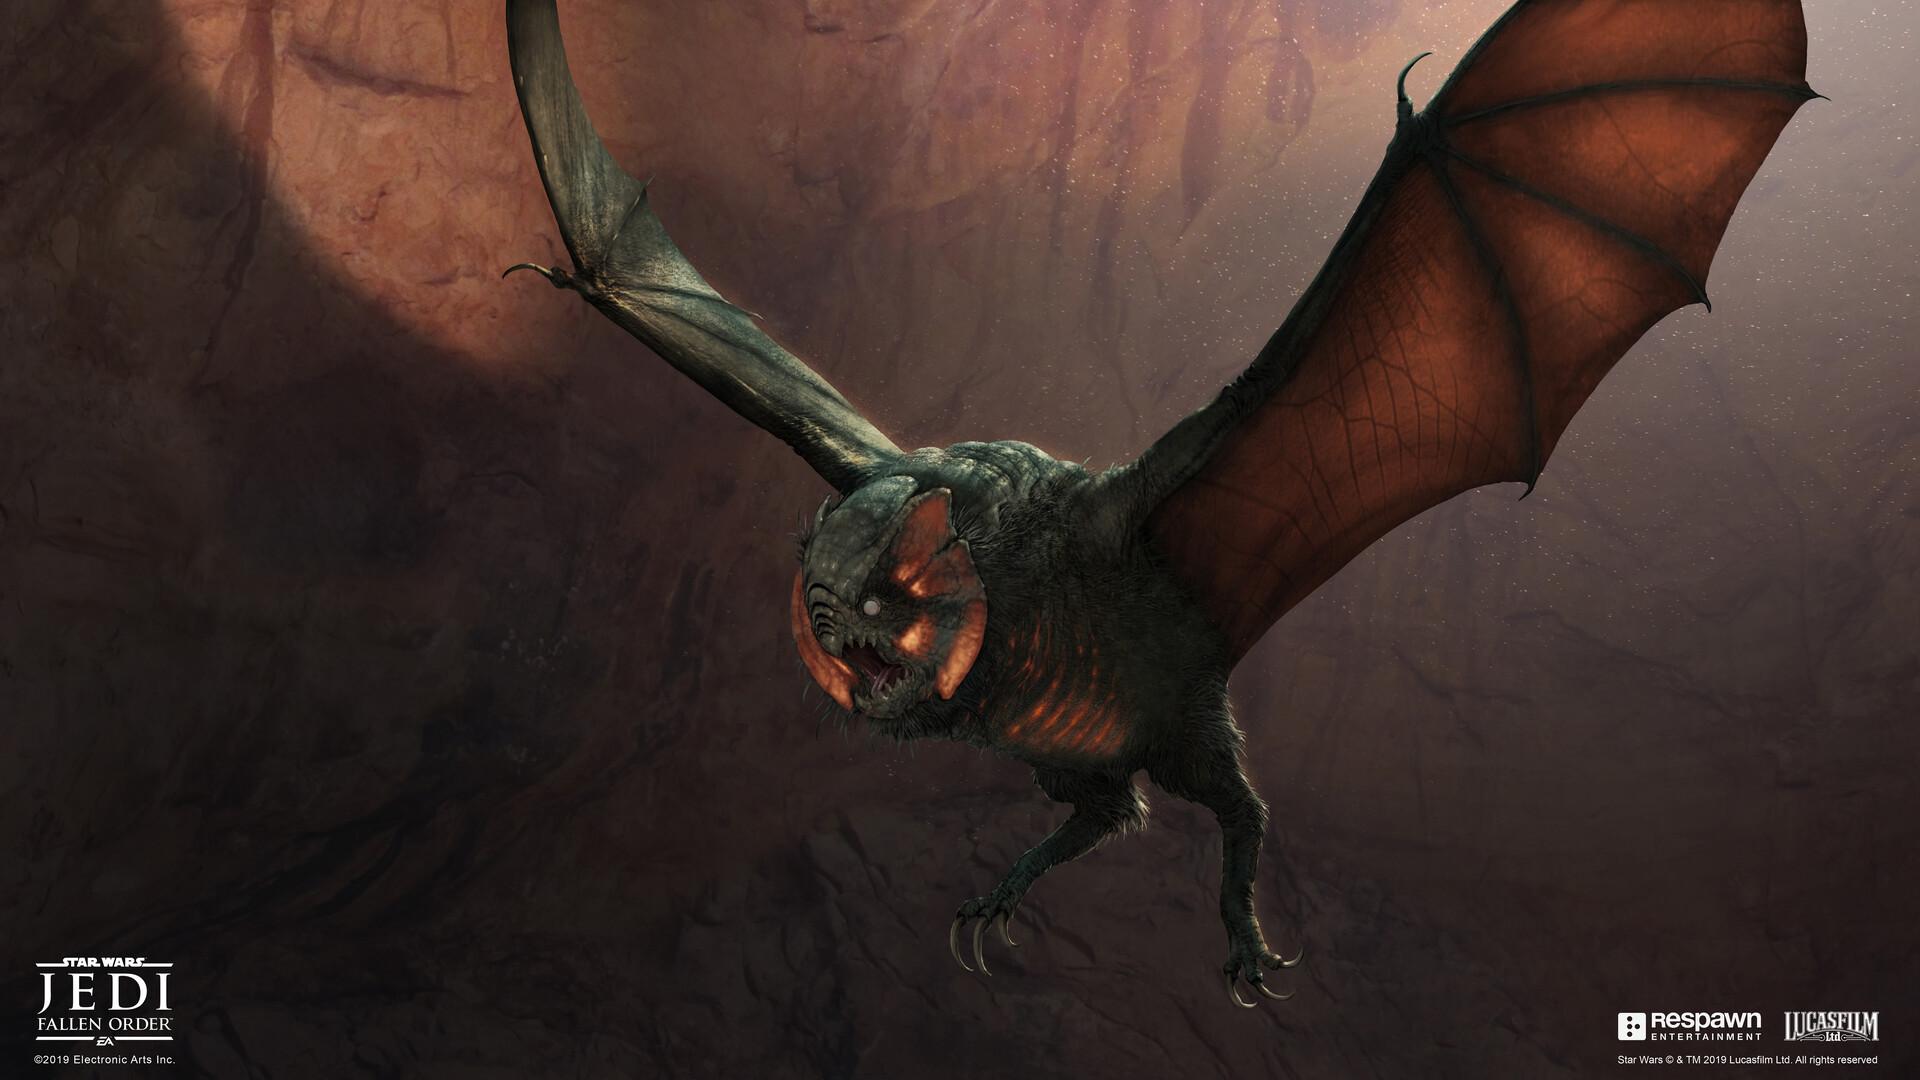 jean-francois-rey-dathomir-bat.jpg?15800